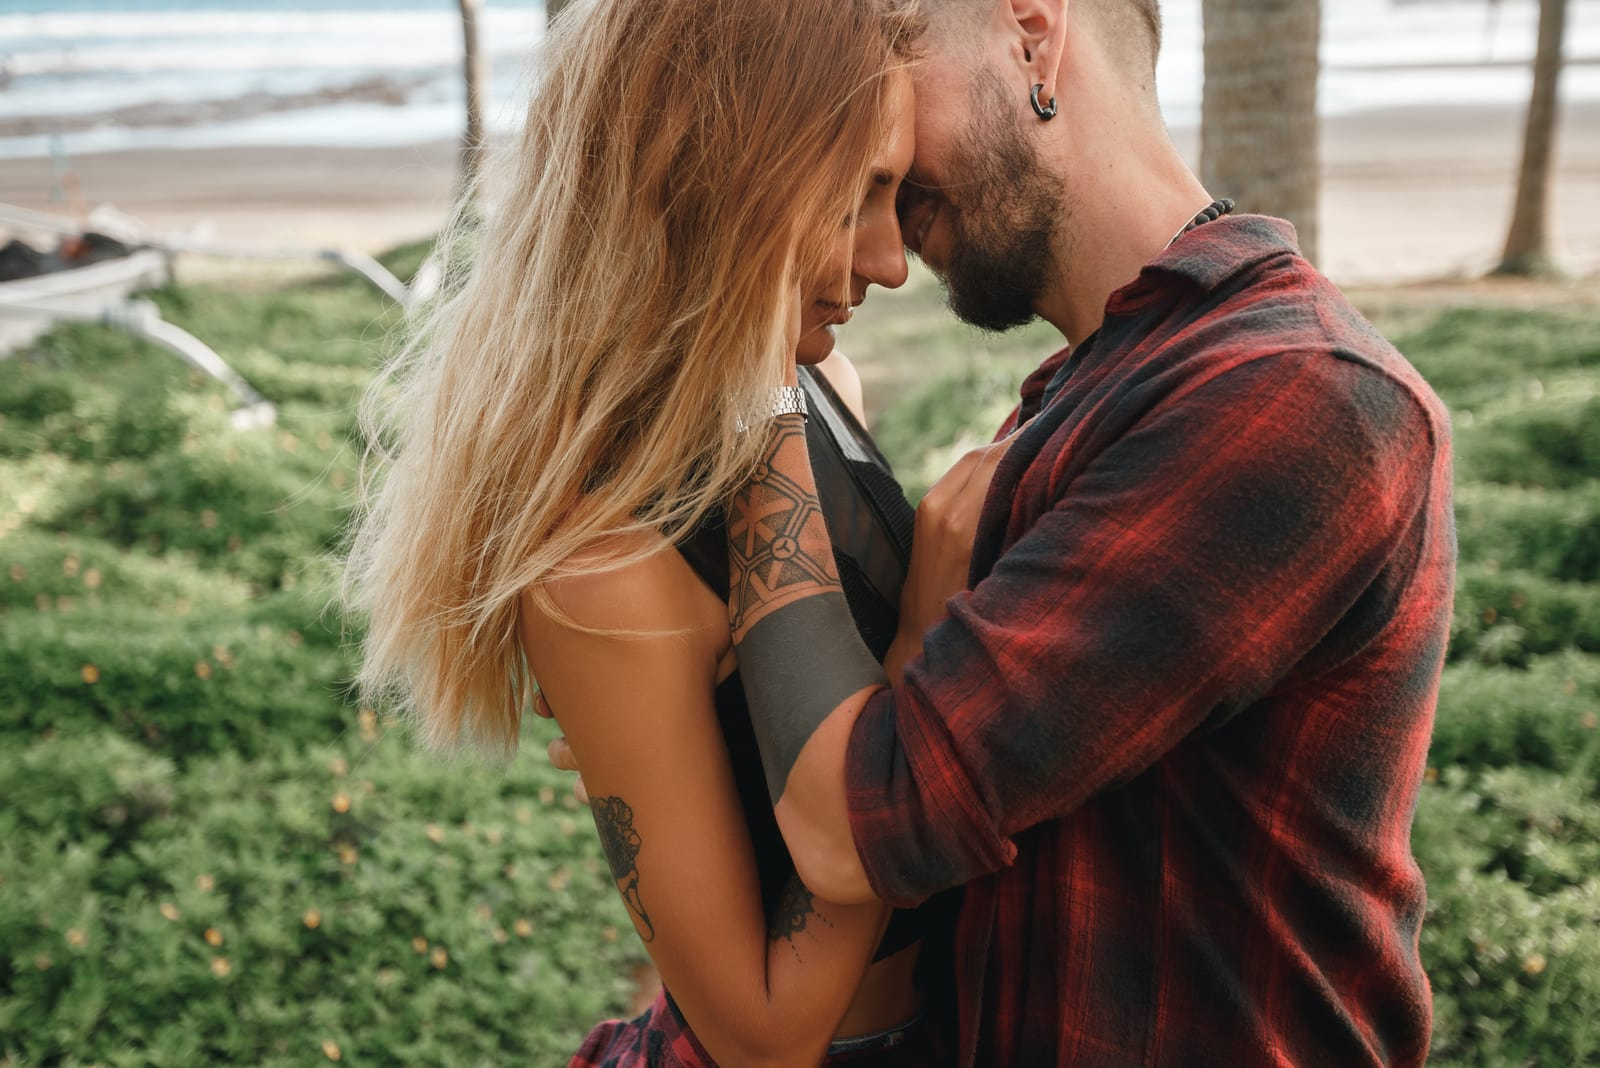 couple cuddling outdoor